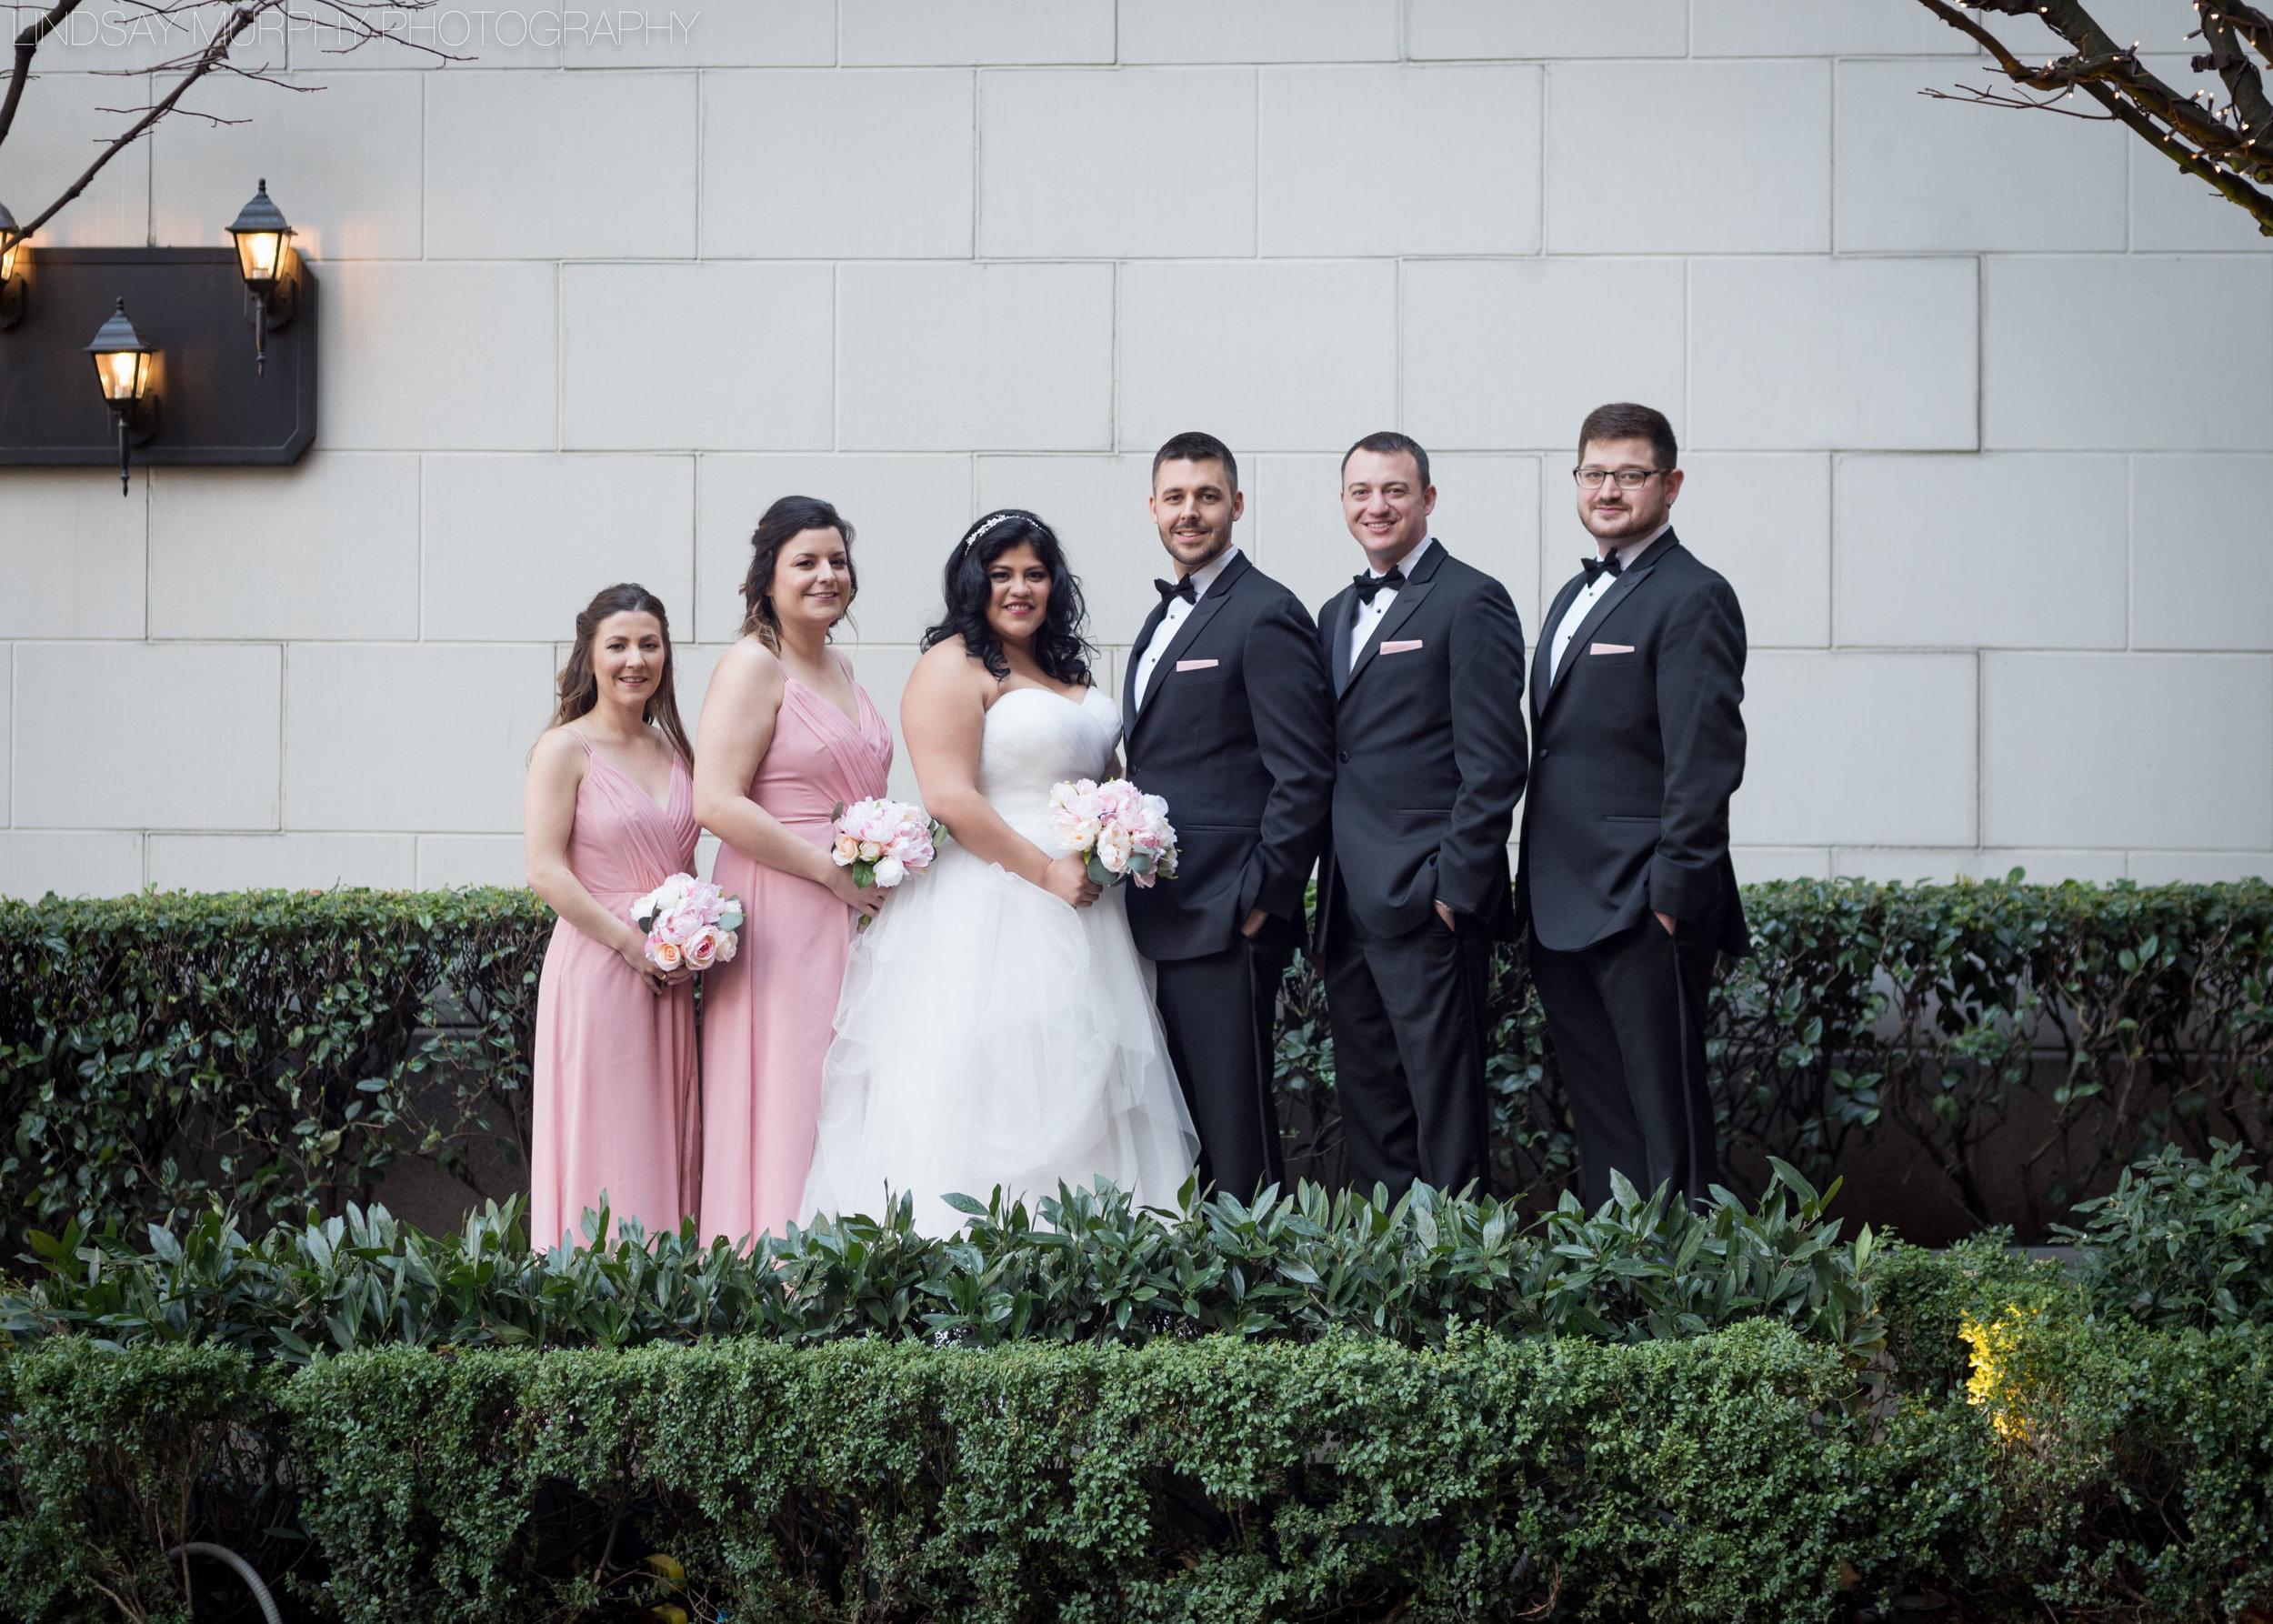 seattle_wedding_photography-36.jpg